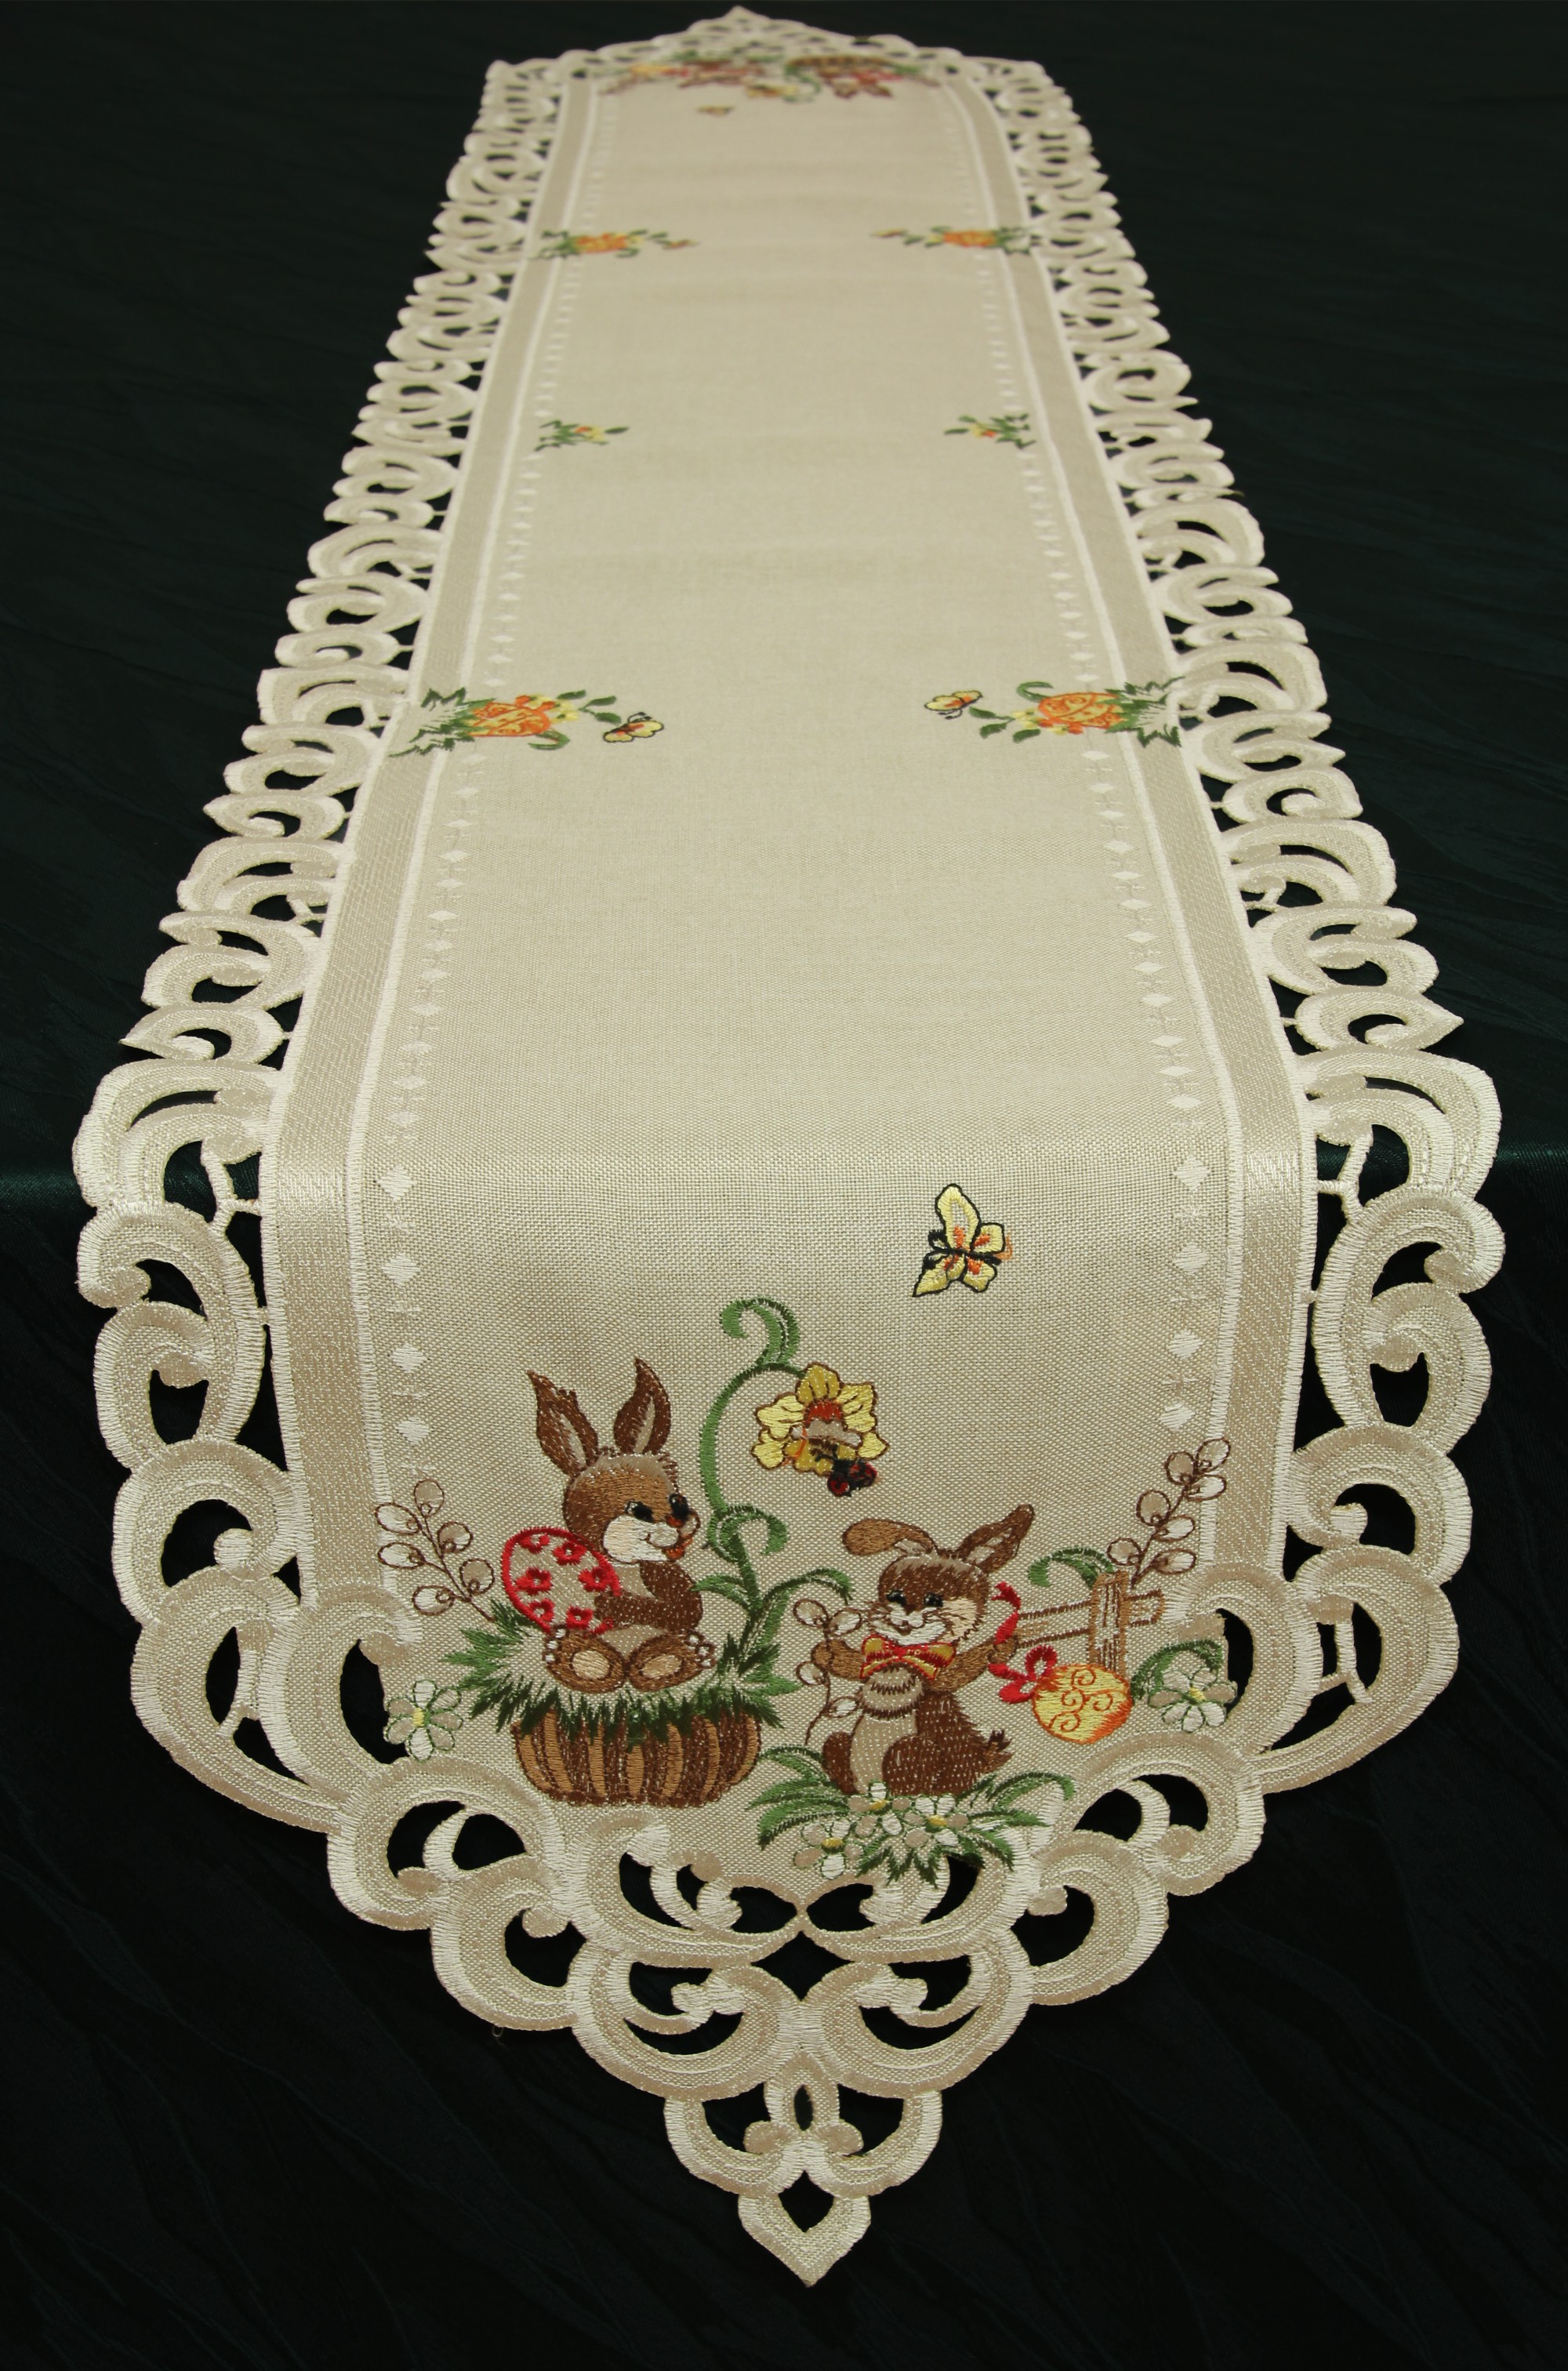 easter table runner doily tablecloth linen look beige. Black Bedroom Furniture Sets. Home Design Ideas